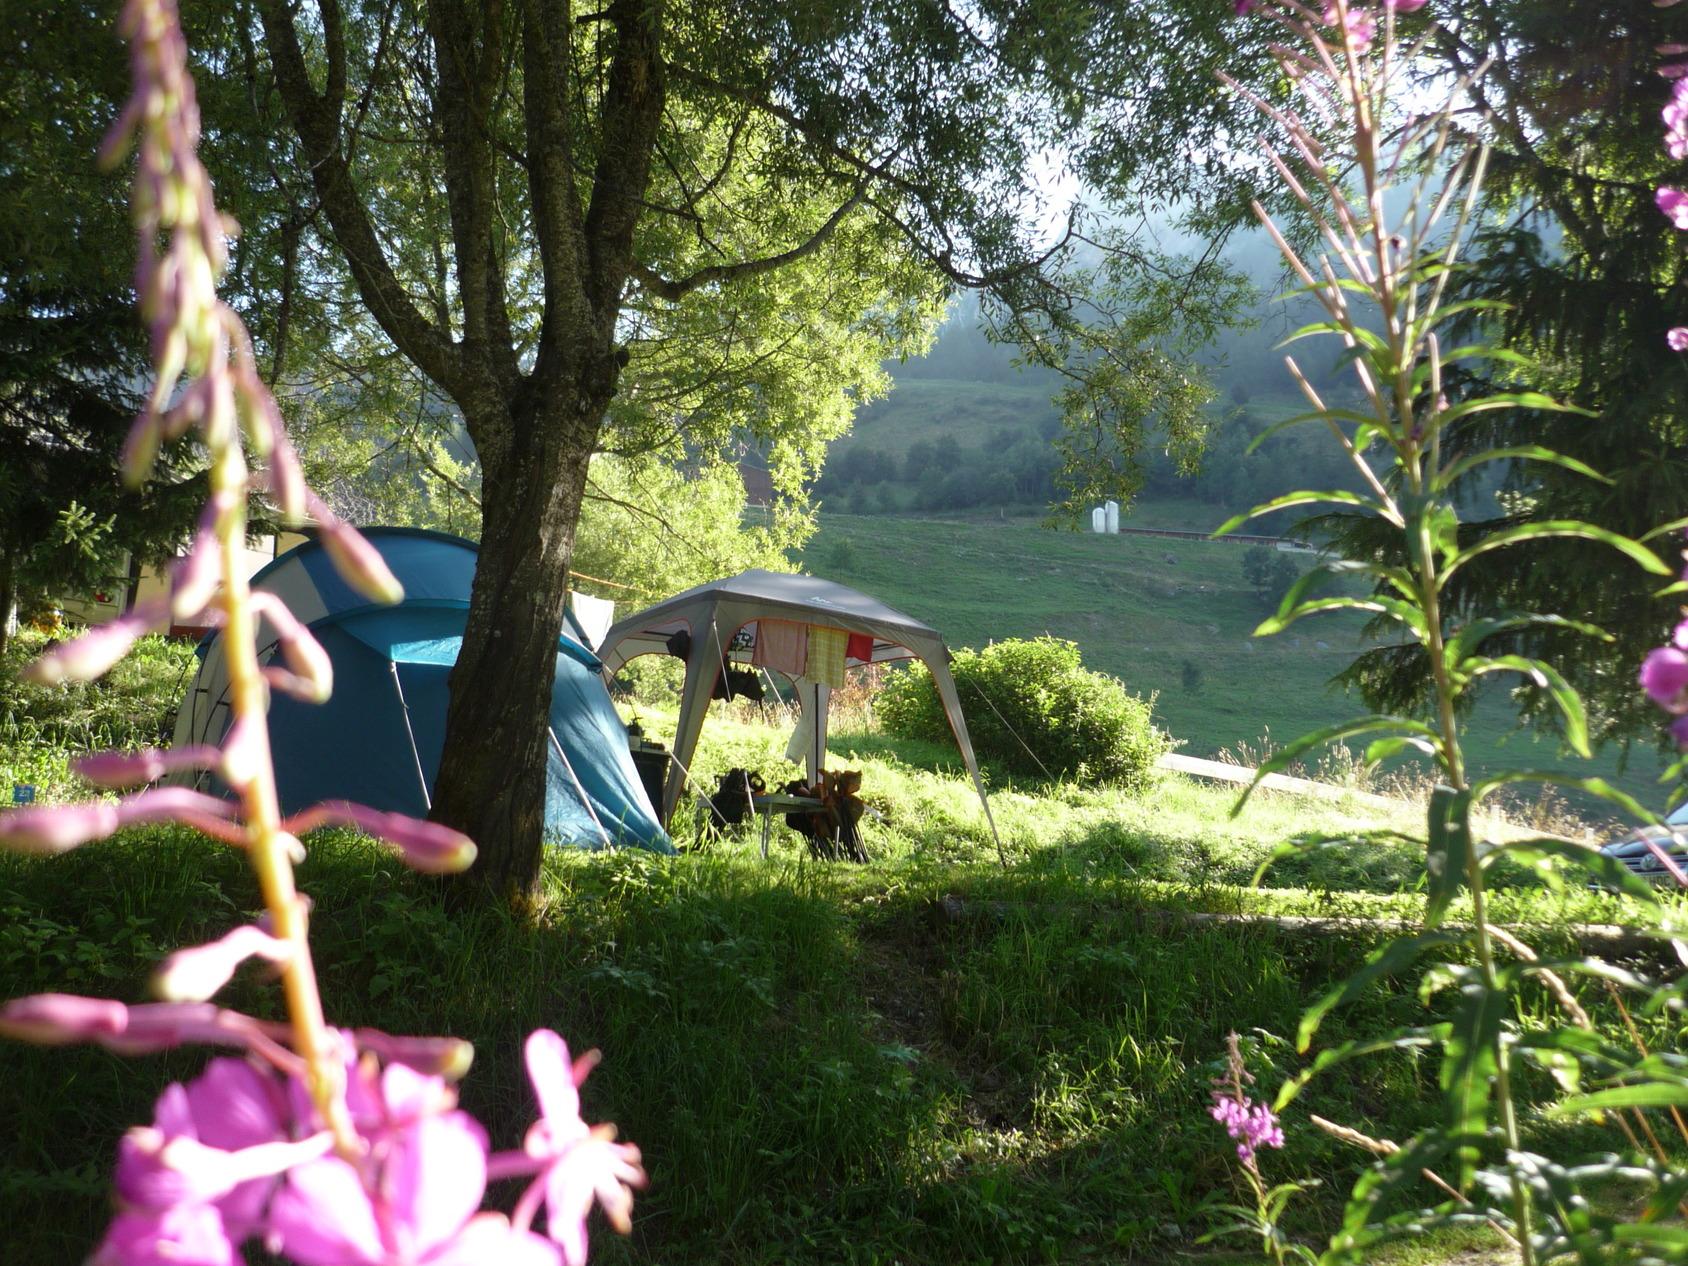 Frankrijk-PeiseyNancroix-Camping%20Les%20Lanchettes-ExtraLarge Wintersport Frankrijk